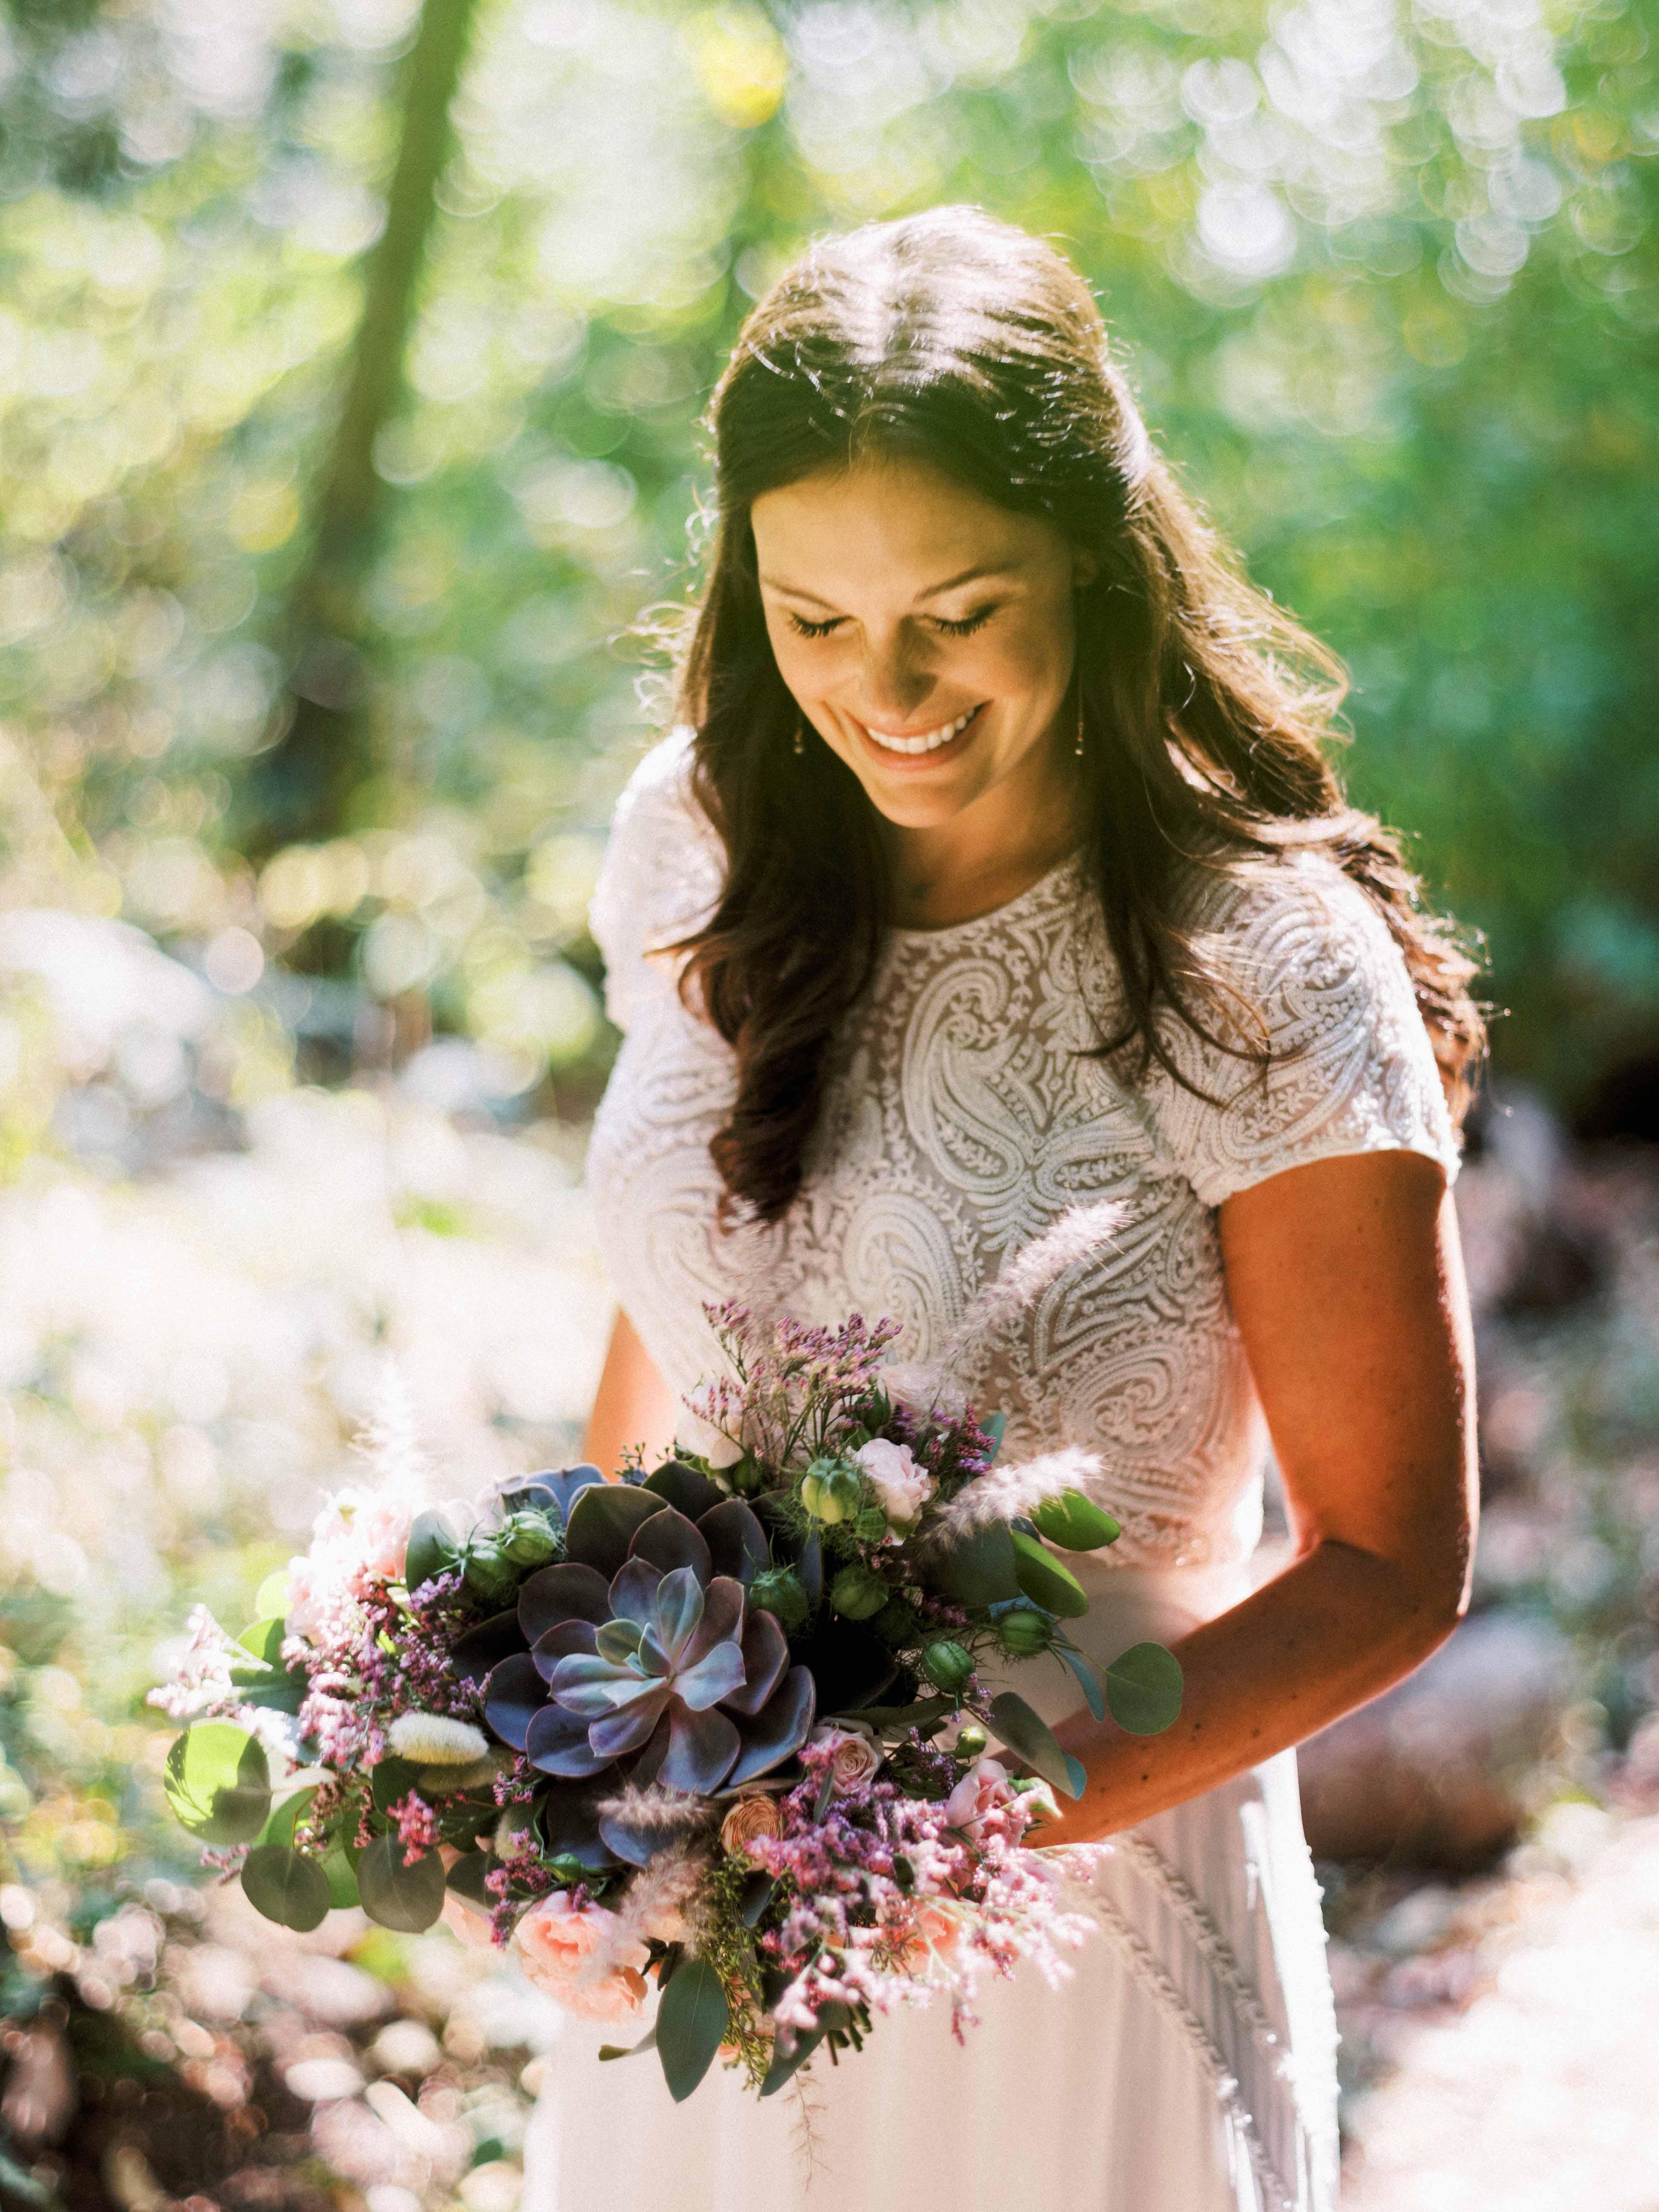 Bride holding wedding bouquet of succulents designed b Flora Nova Design